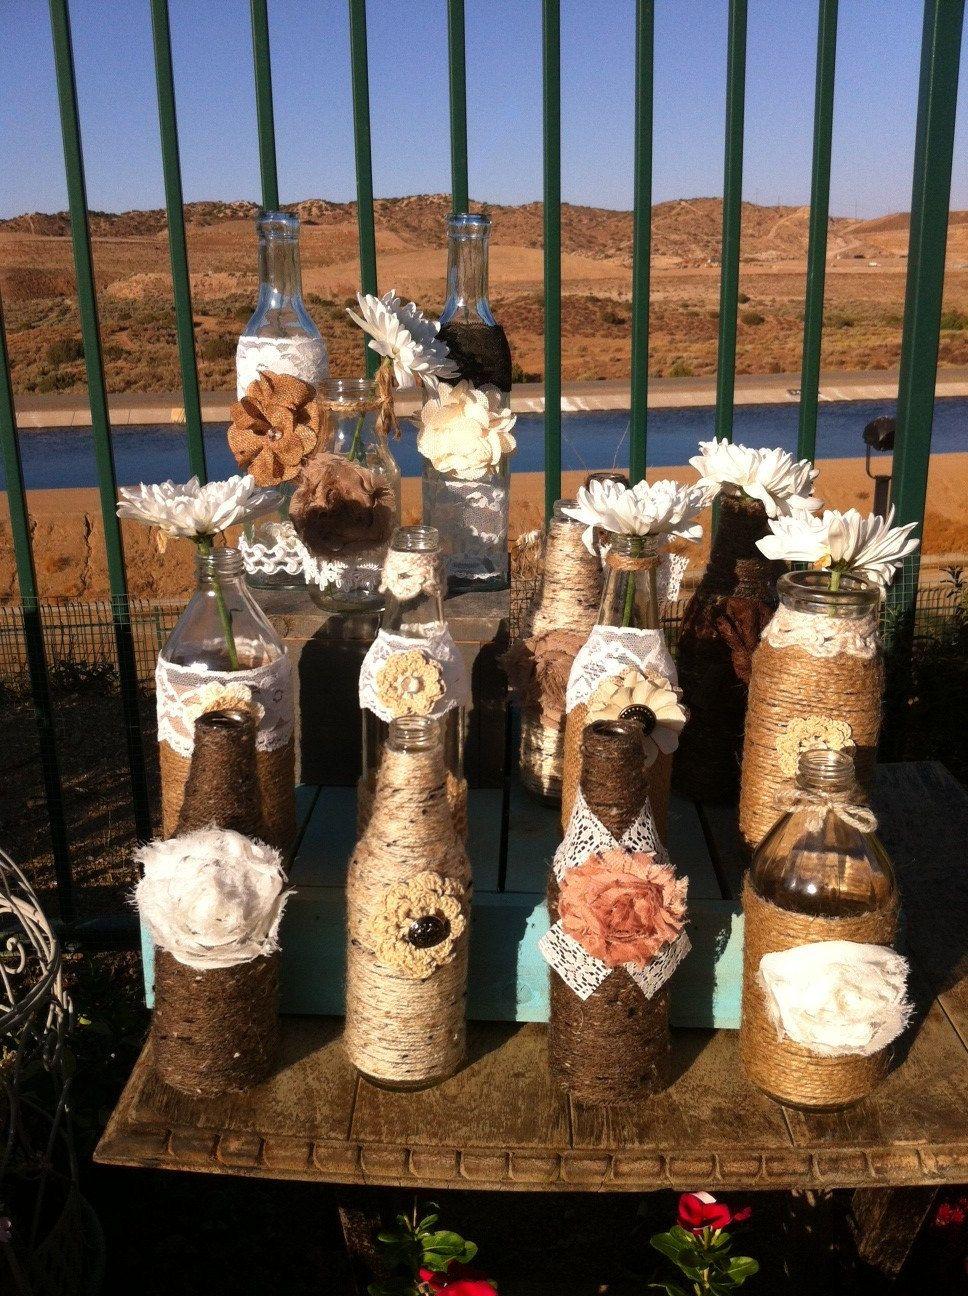 Vintage rustic chic wedding vase bottle centerpieces crafts vintage rustic chic wedding vase bottle centerpieces reviewsmspy